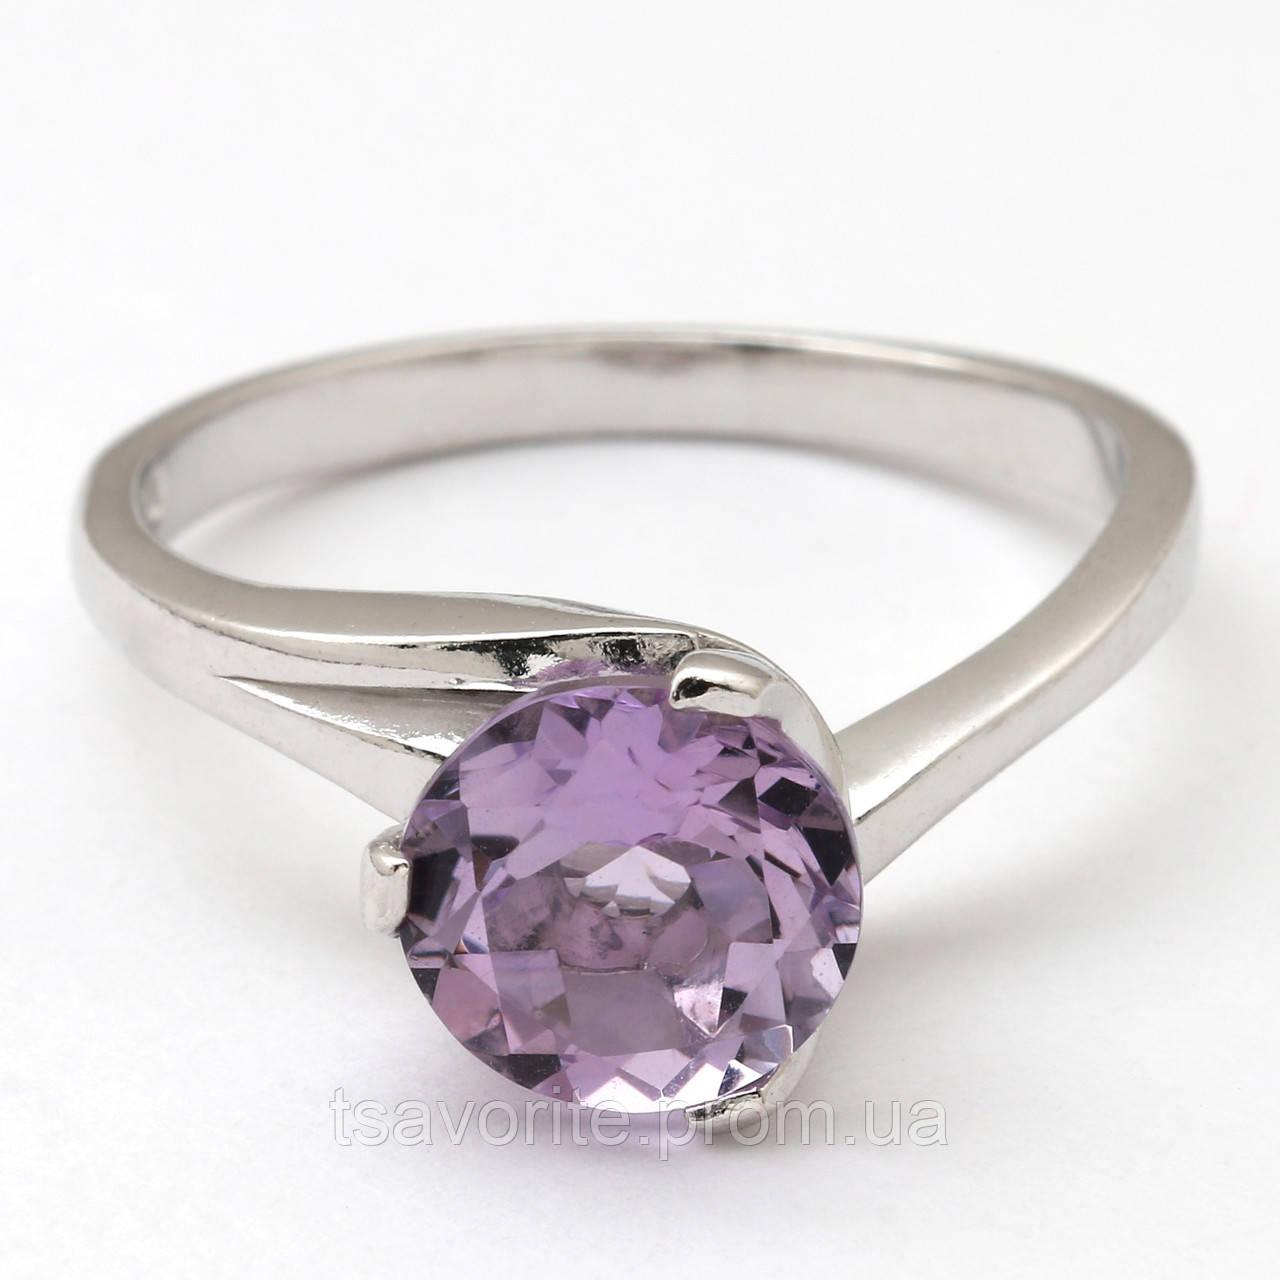 Серебряное кольцо с аметистом КЖХ-18